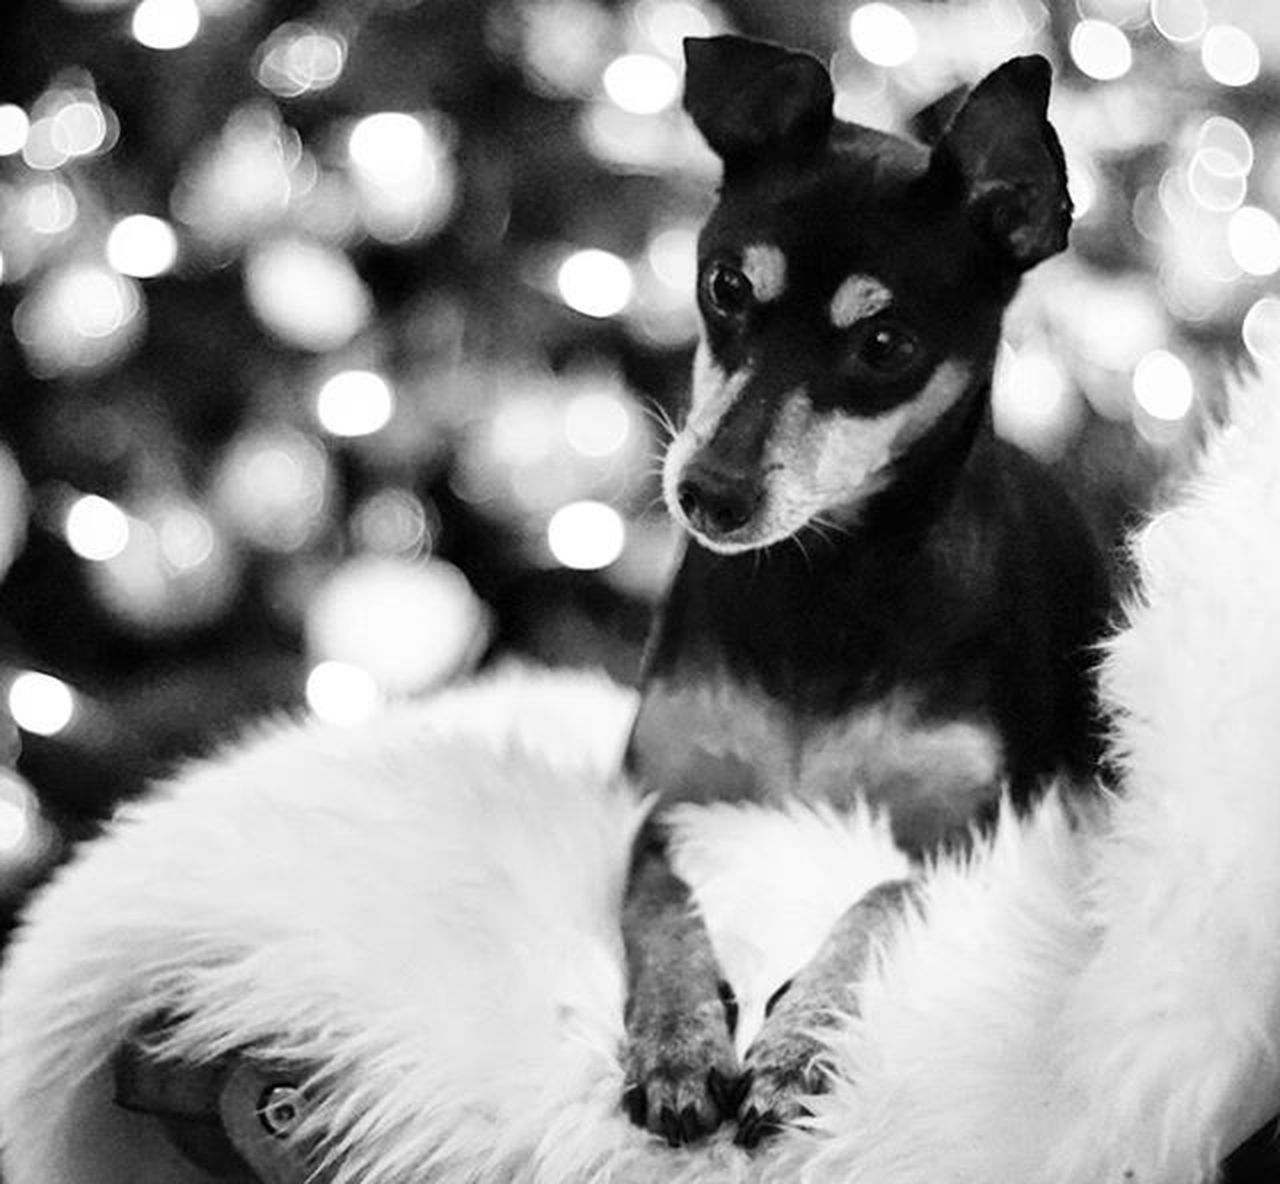 Christmas MerryChristmas Natale  Animali Animals Minipin Chanel Minipinscher Pincher Zwergpinscher Dog Dogoftheday Dogofinstagram Puppy Love Lovemydog Life Pincher Chiuaua Beauty Cutedog Cute Brunette Lights Christmastree christmasdecorations